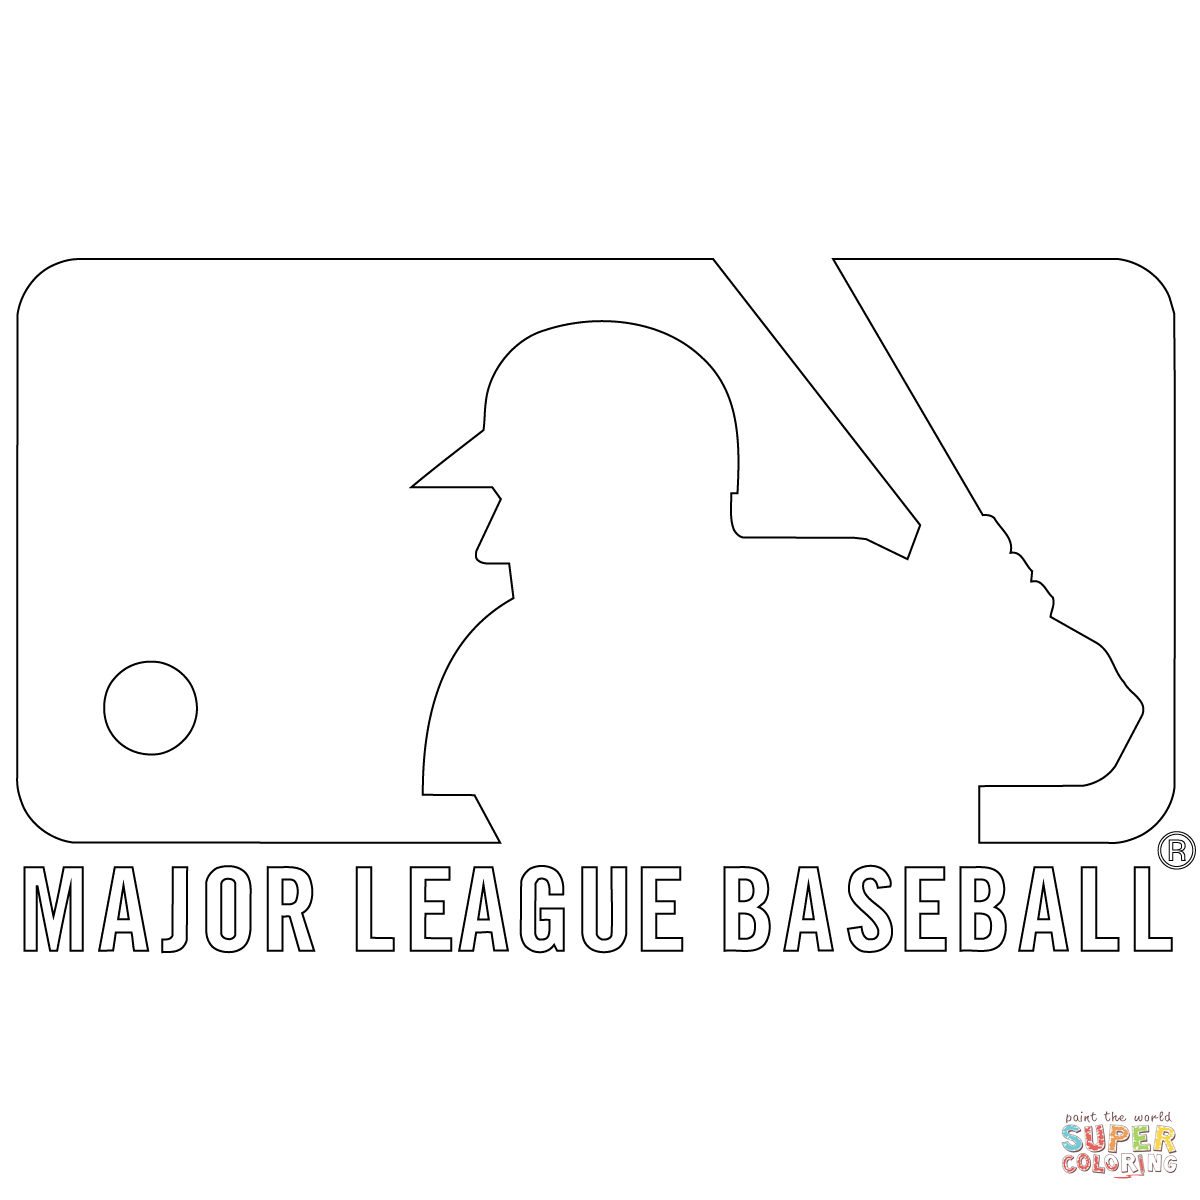 Mlb Logo Coloring Page | Free Printable Coloring Pages - Free Printable Baseball Logos